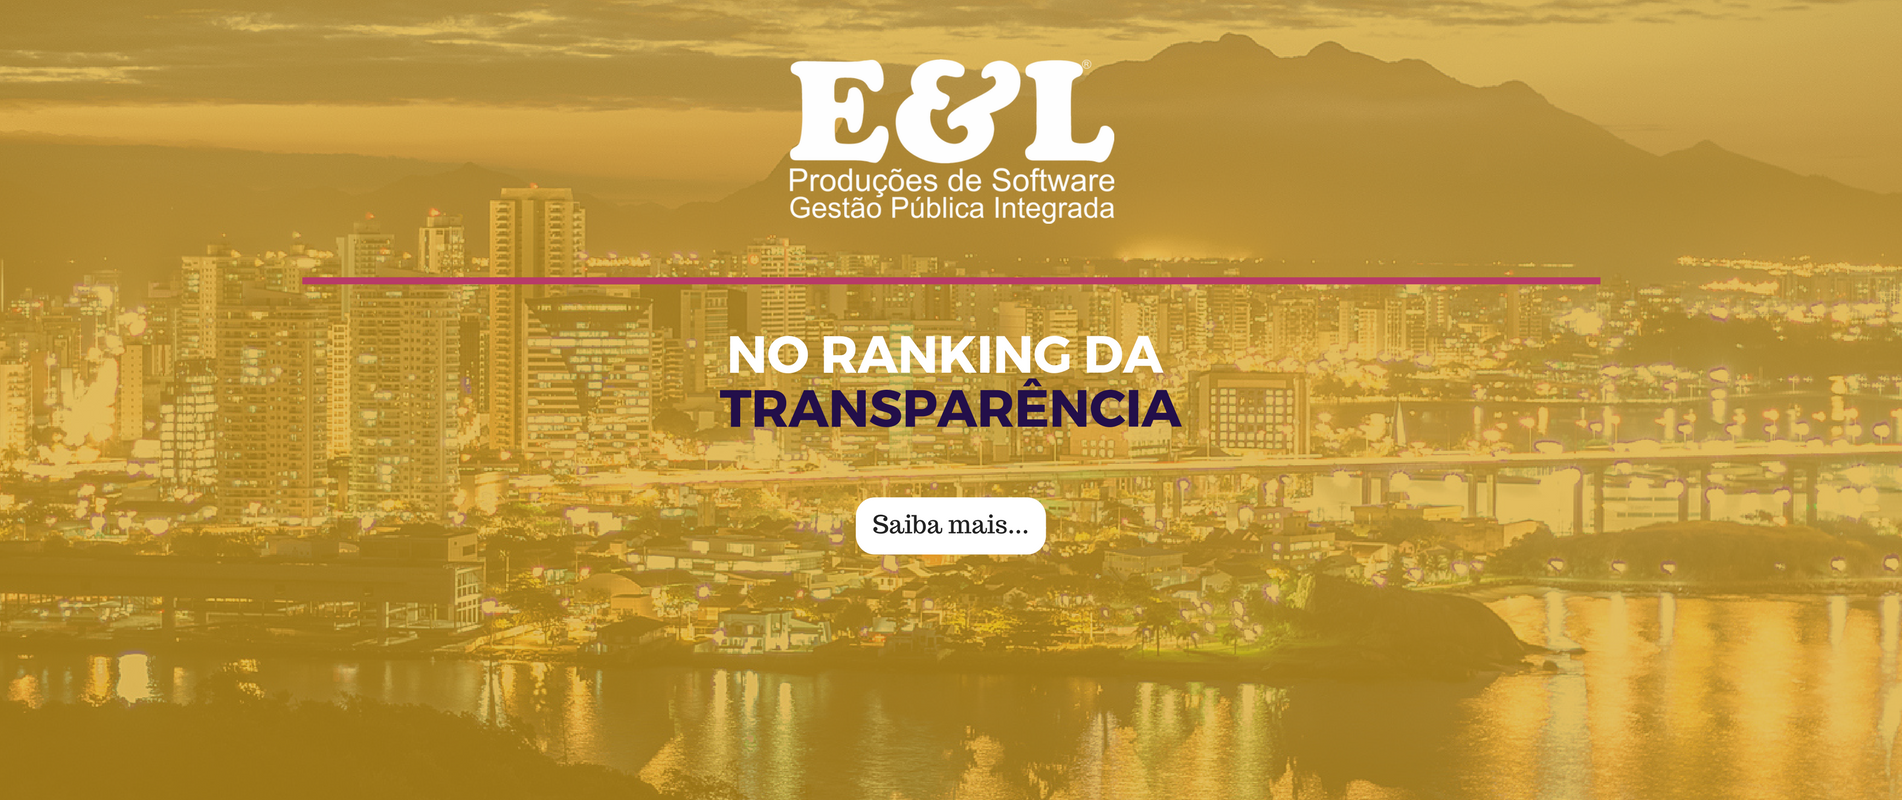 BANNER_NO RANKING DA TRANSPARÊNCIA